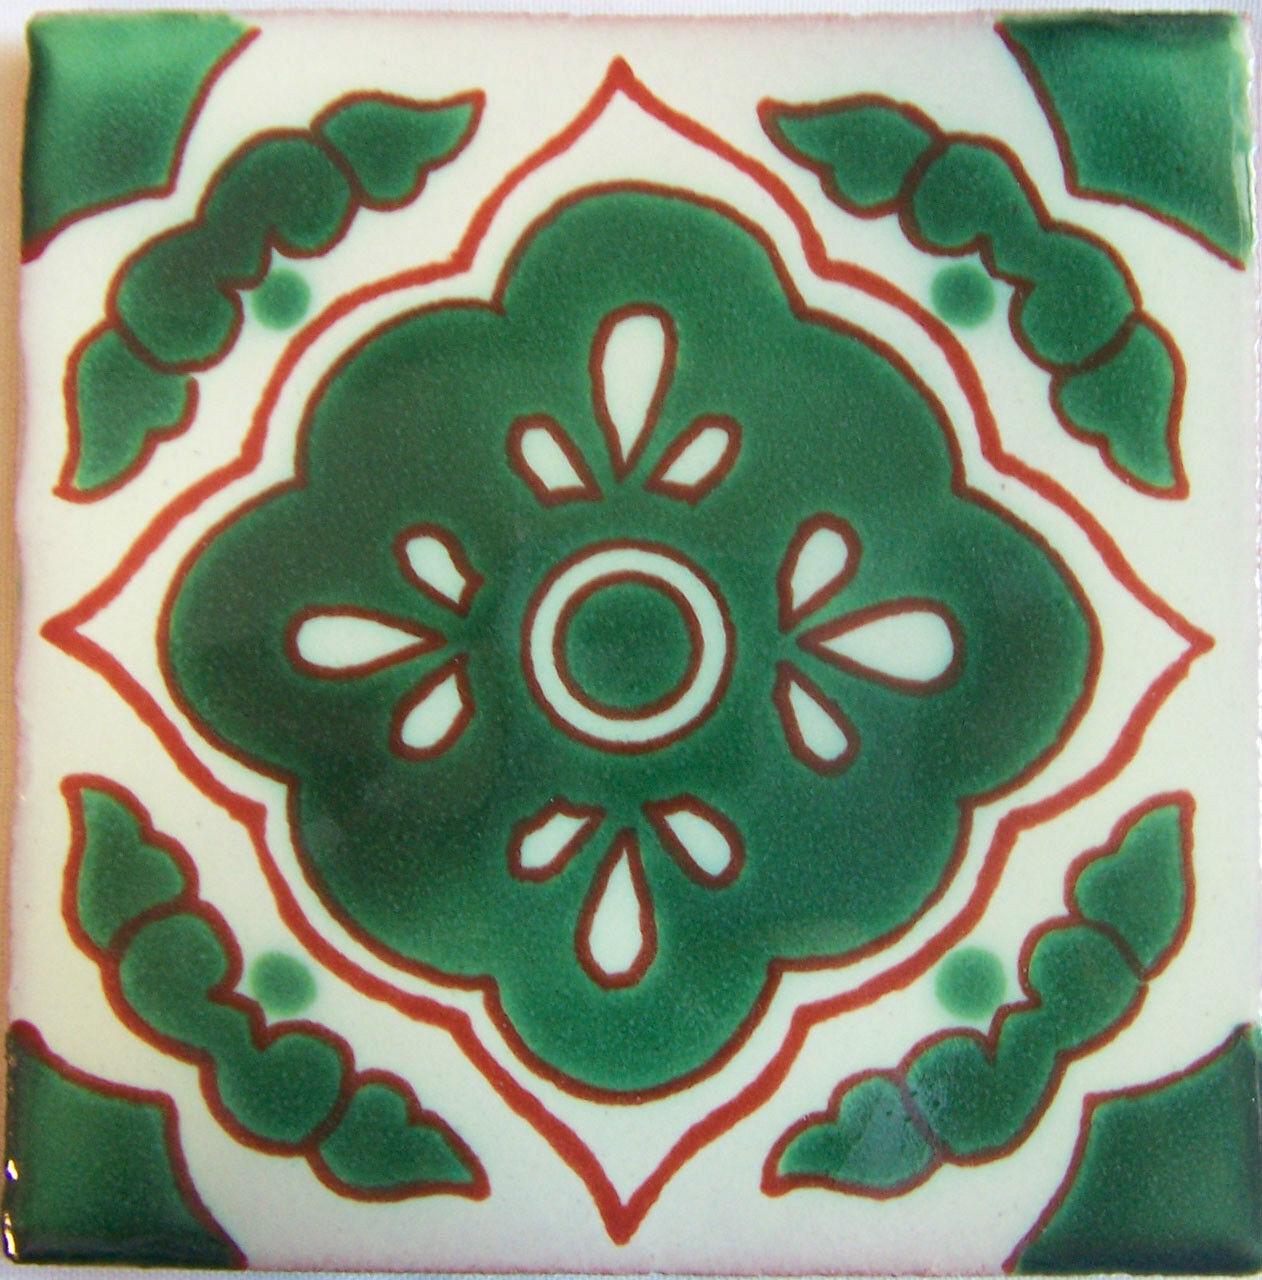 C303 - Mexican Handmade Talavera Clay Tile Folk Art 4x4